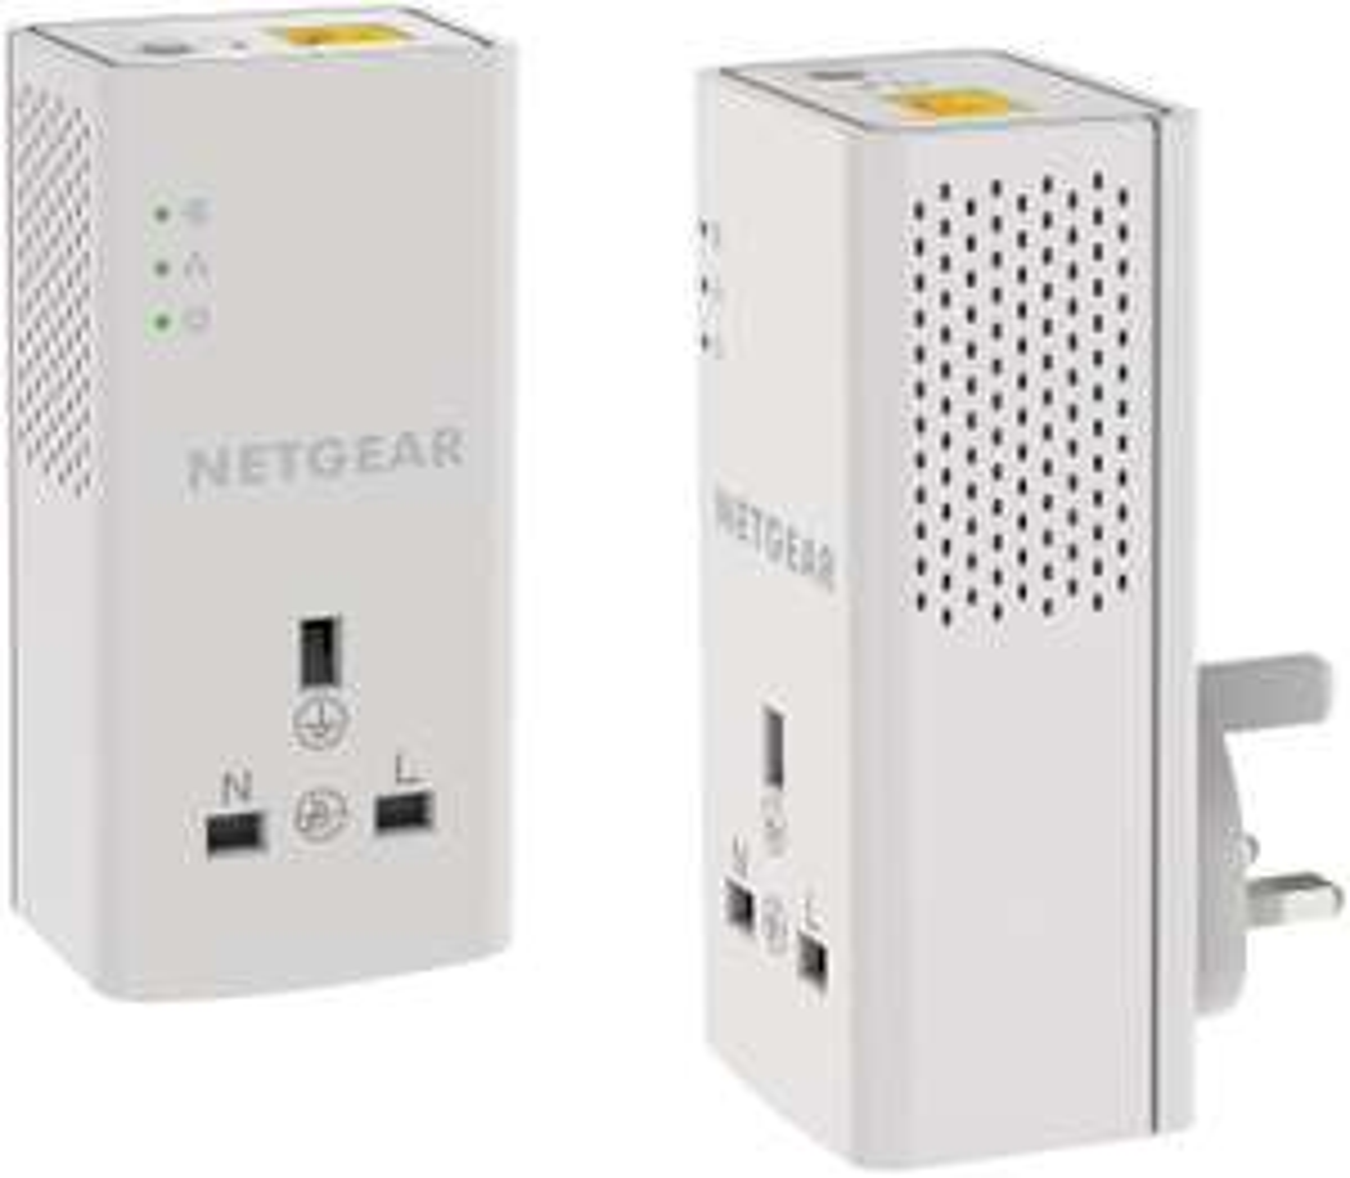 Netgear 1000Mbps (1 Gigabit - Pack of 2) Powerline Kit and Pass Through, £37.99 at Argos